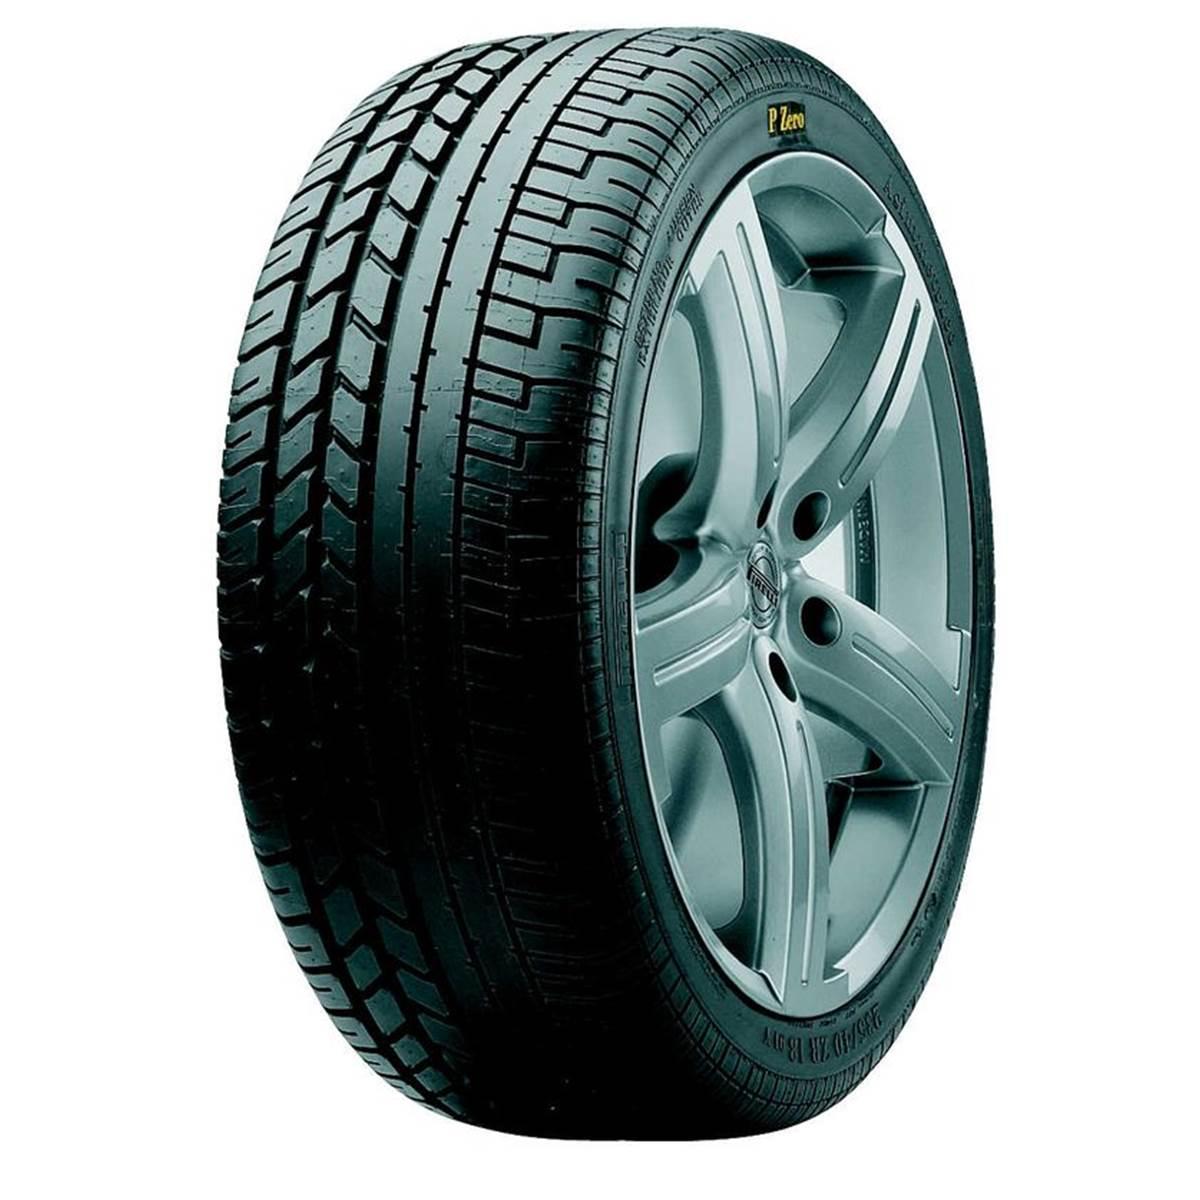 Pneu Pirelli 255/40R18 95Y Pzero Asimmetrico